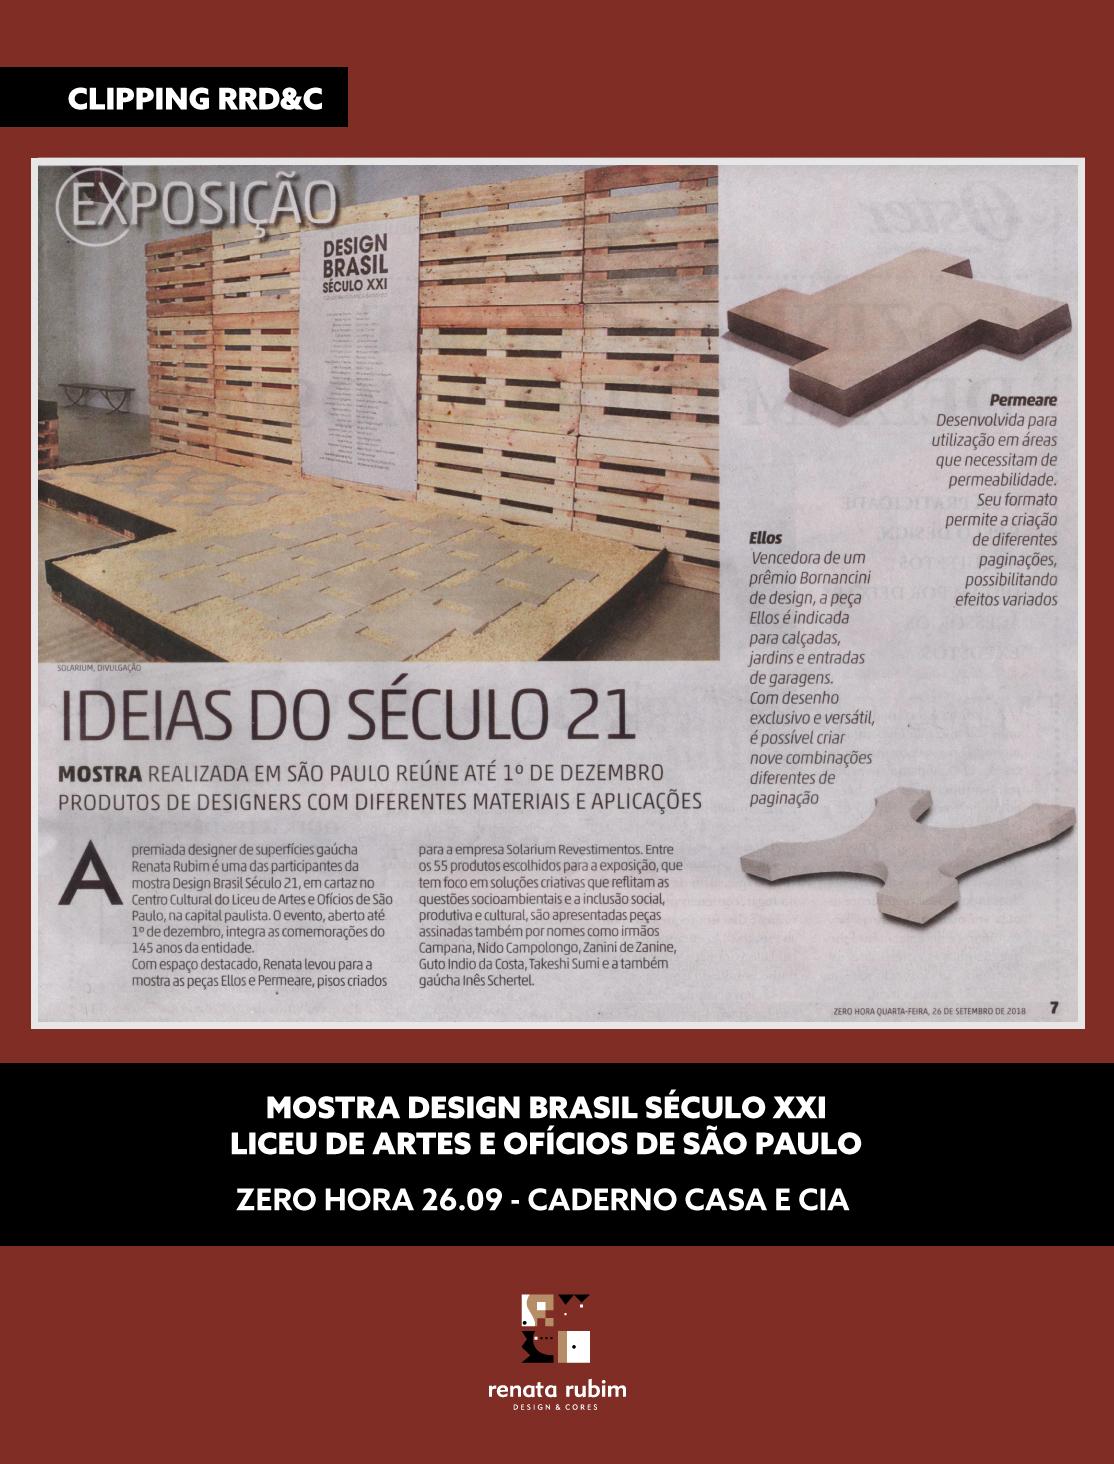 Mostra Design Brasil Século XXI